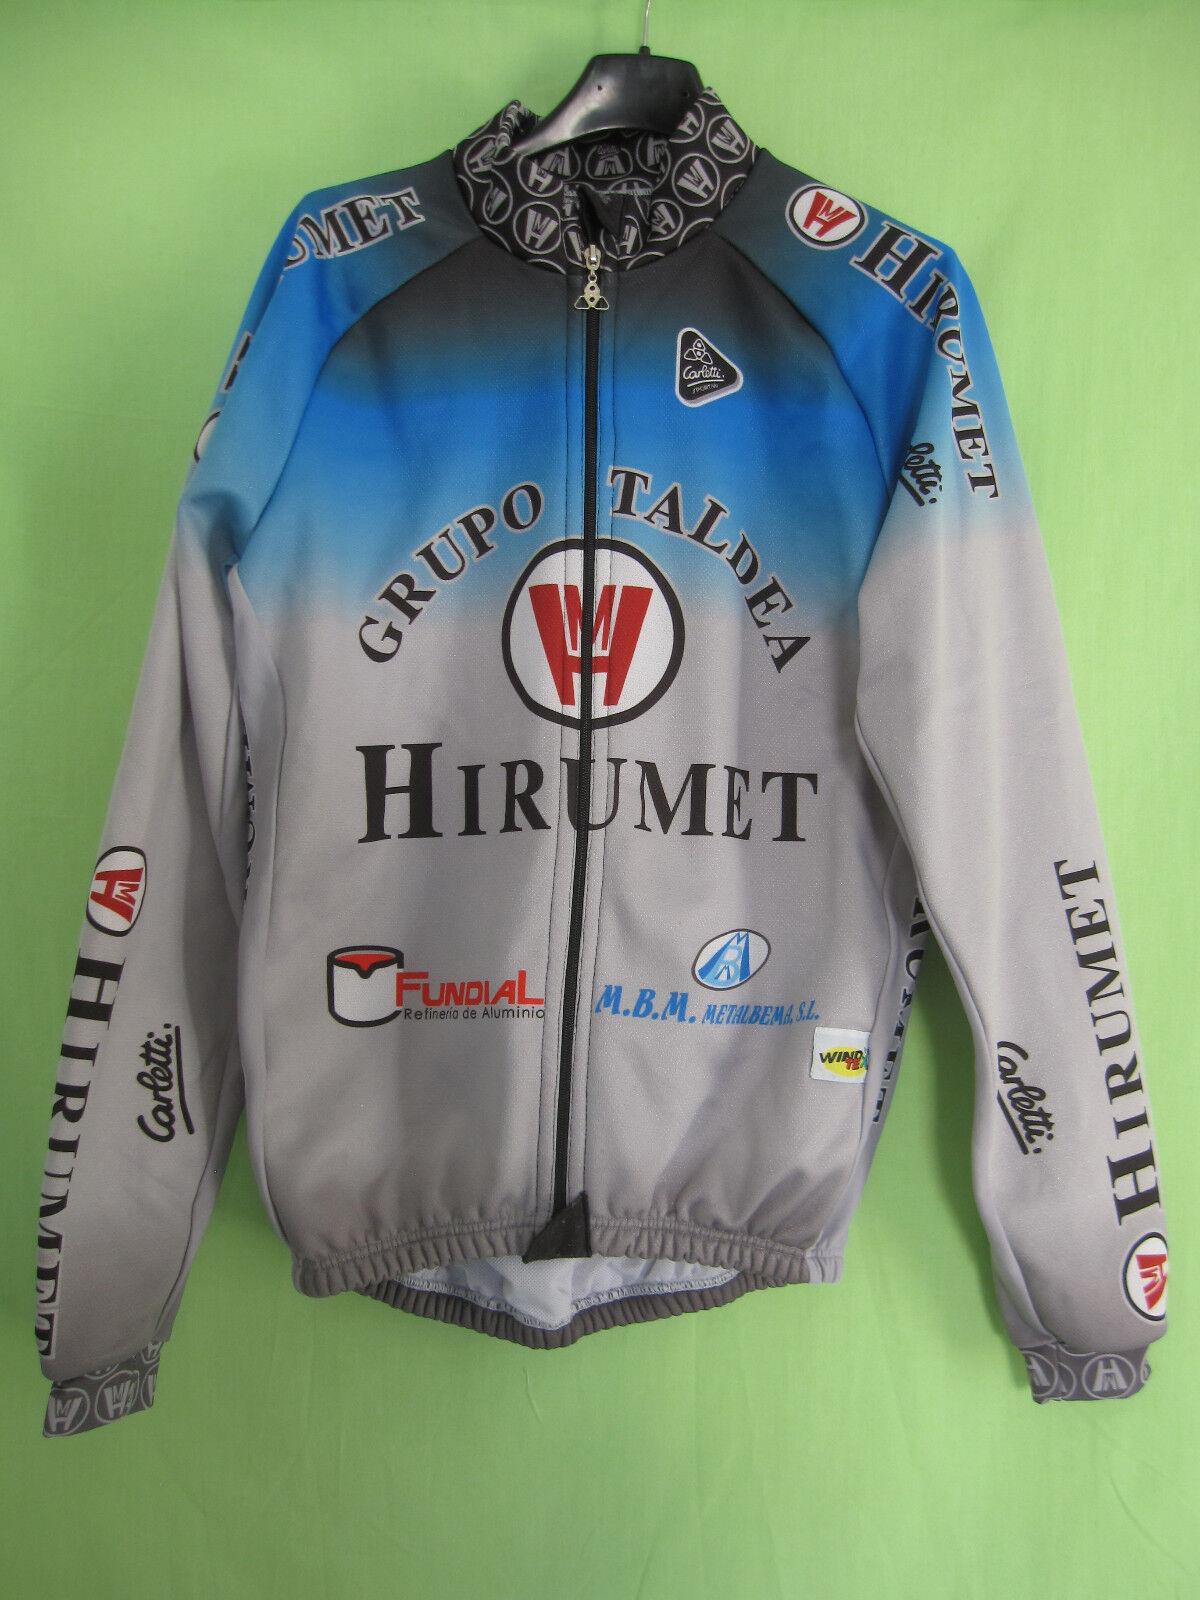 Veste cycliste Grupo Hirumet Taldea carletti Vintage Team pro Spain - L